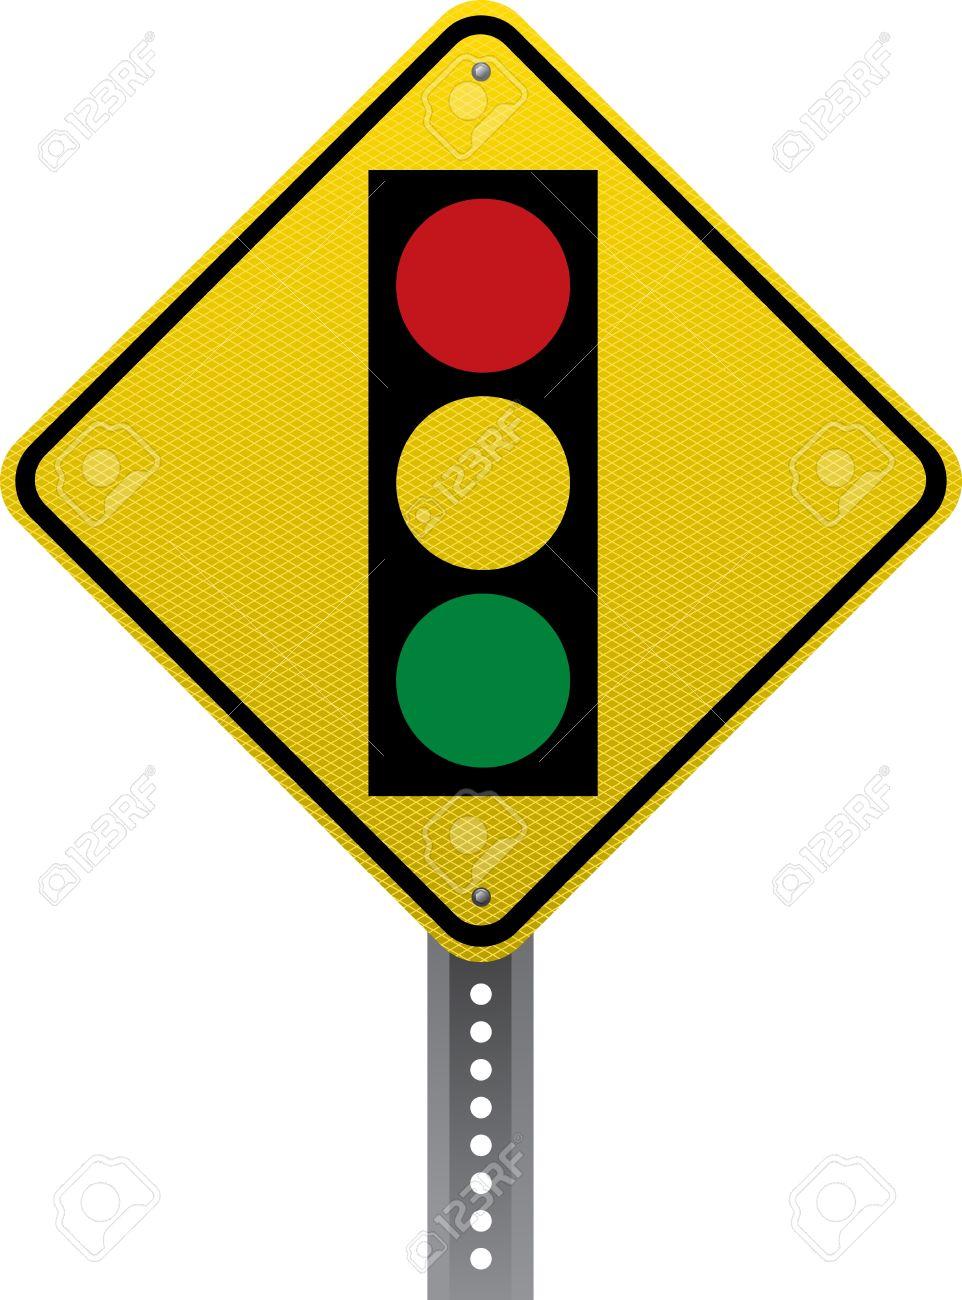 Traffic signal traffic warning sign diamond shaped traffic signs traffic signal traffic warning sign diamond shaped traffic signs warn drivers of upcoming road biocorpaavc Choice Image